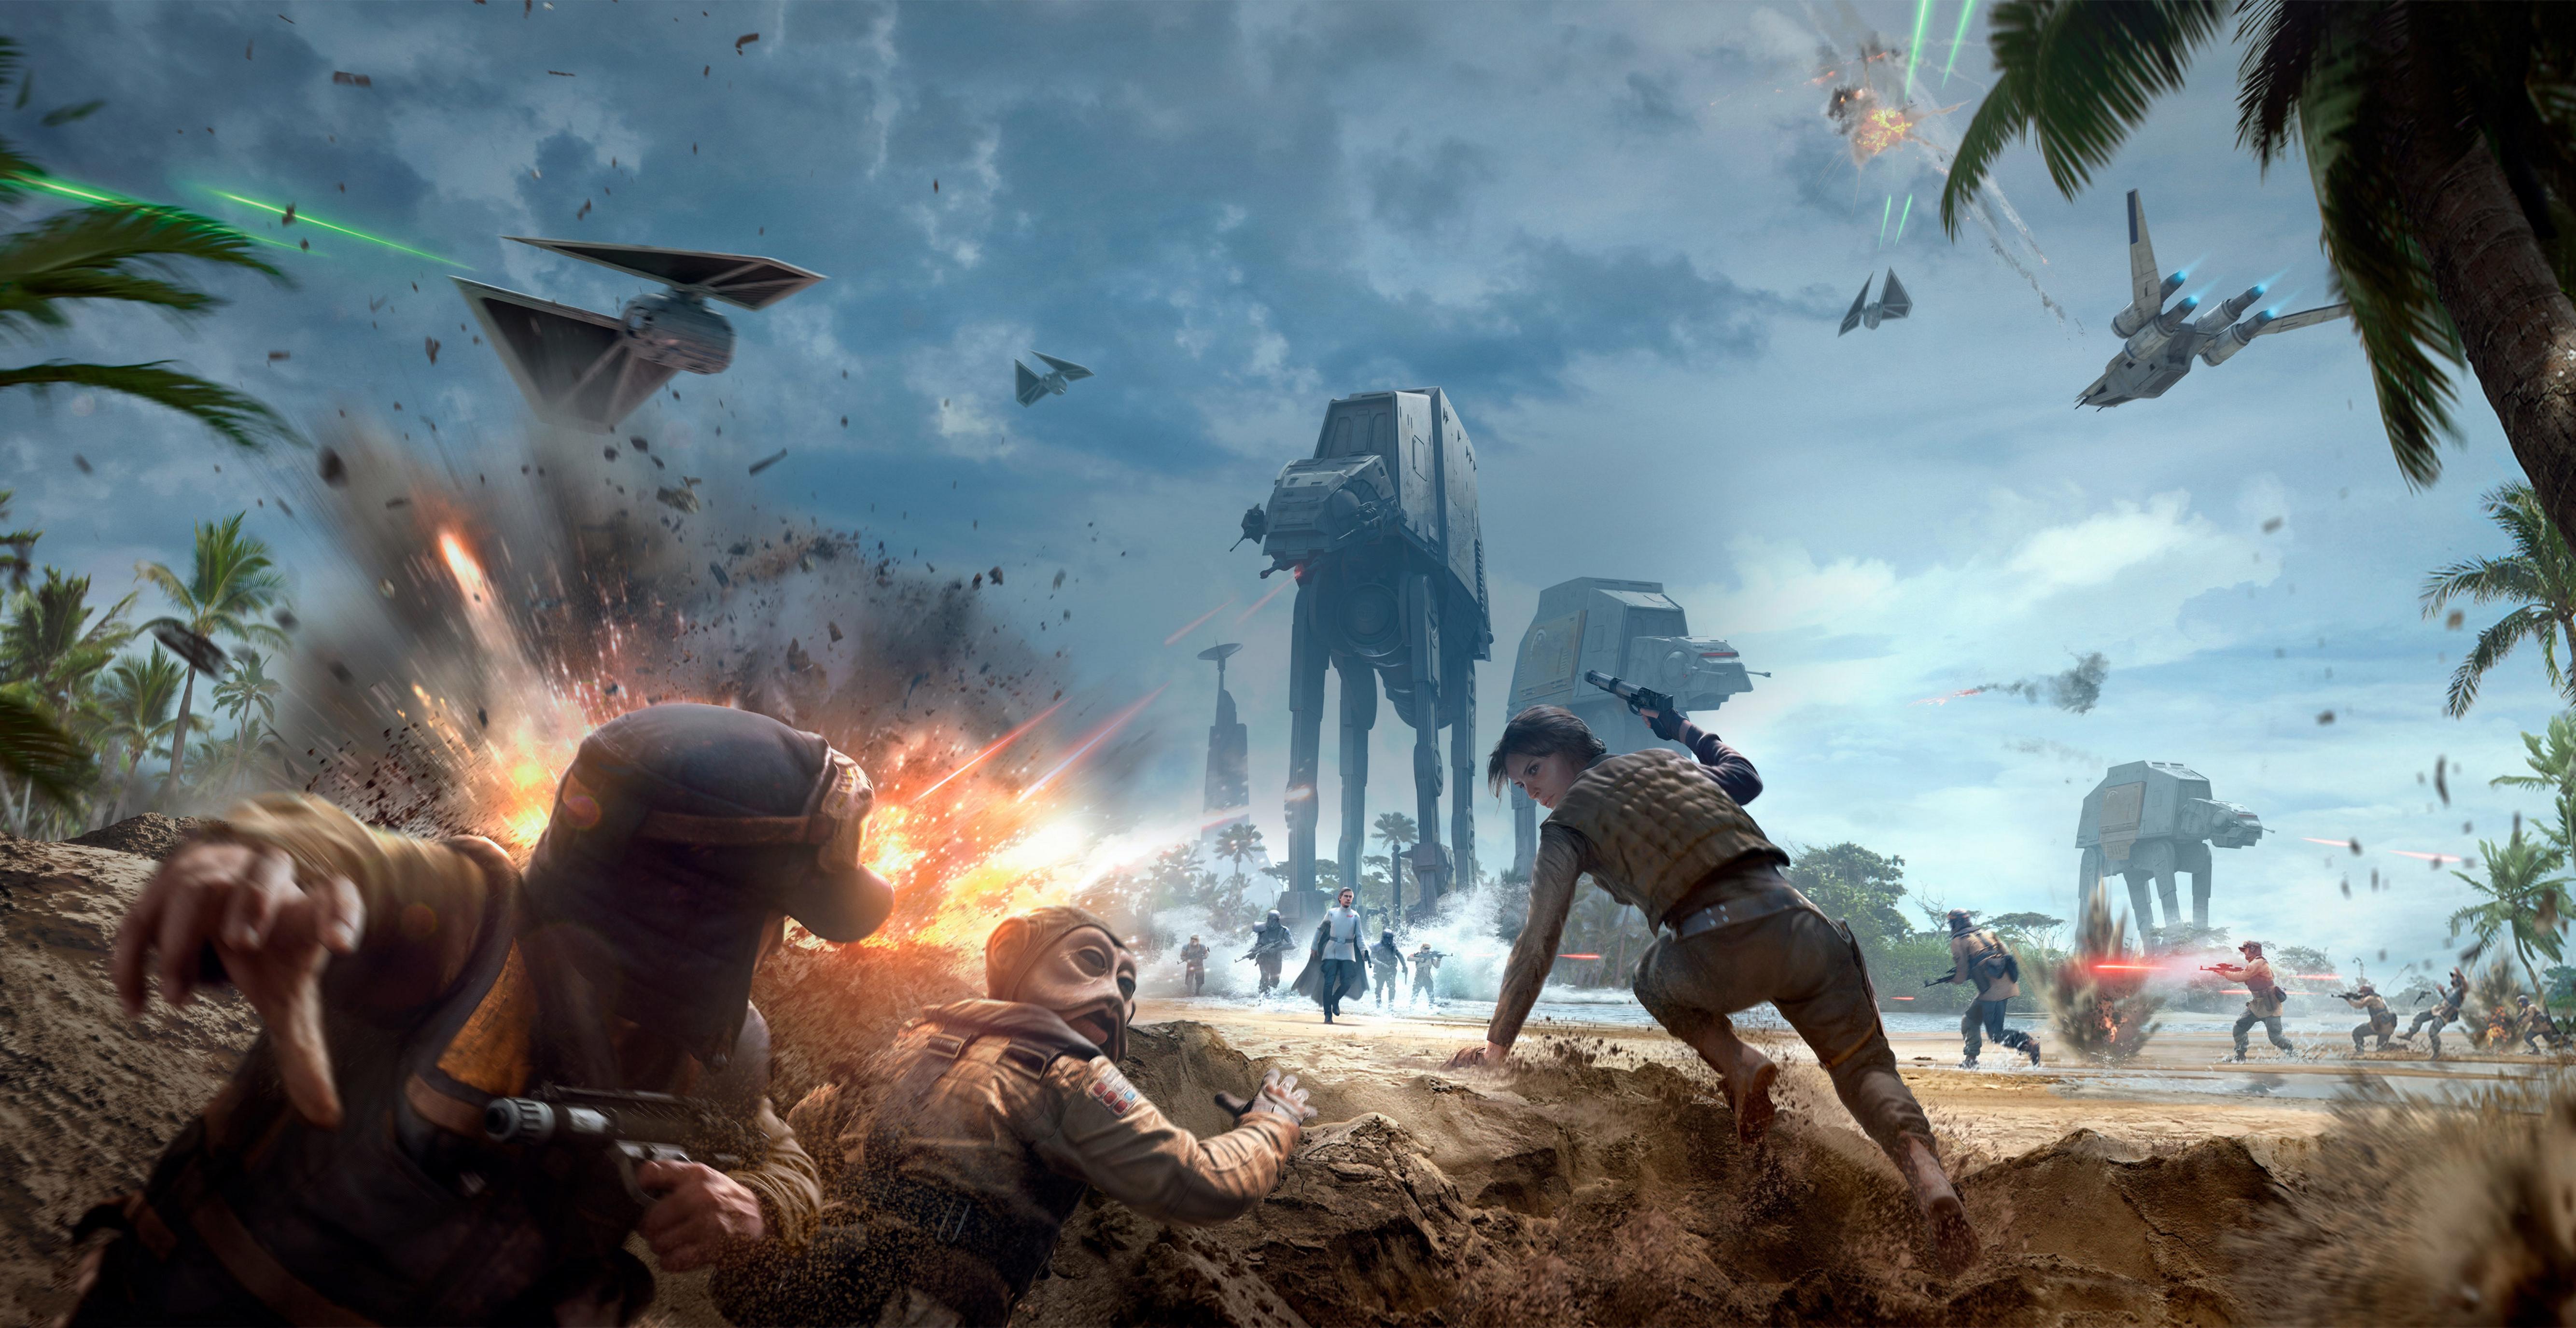 Star Wars Battle Backgrounds: Star Wars Battlefront (2015) 4k Ultra HD Wallpaper